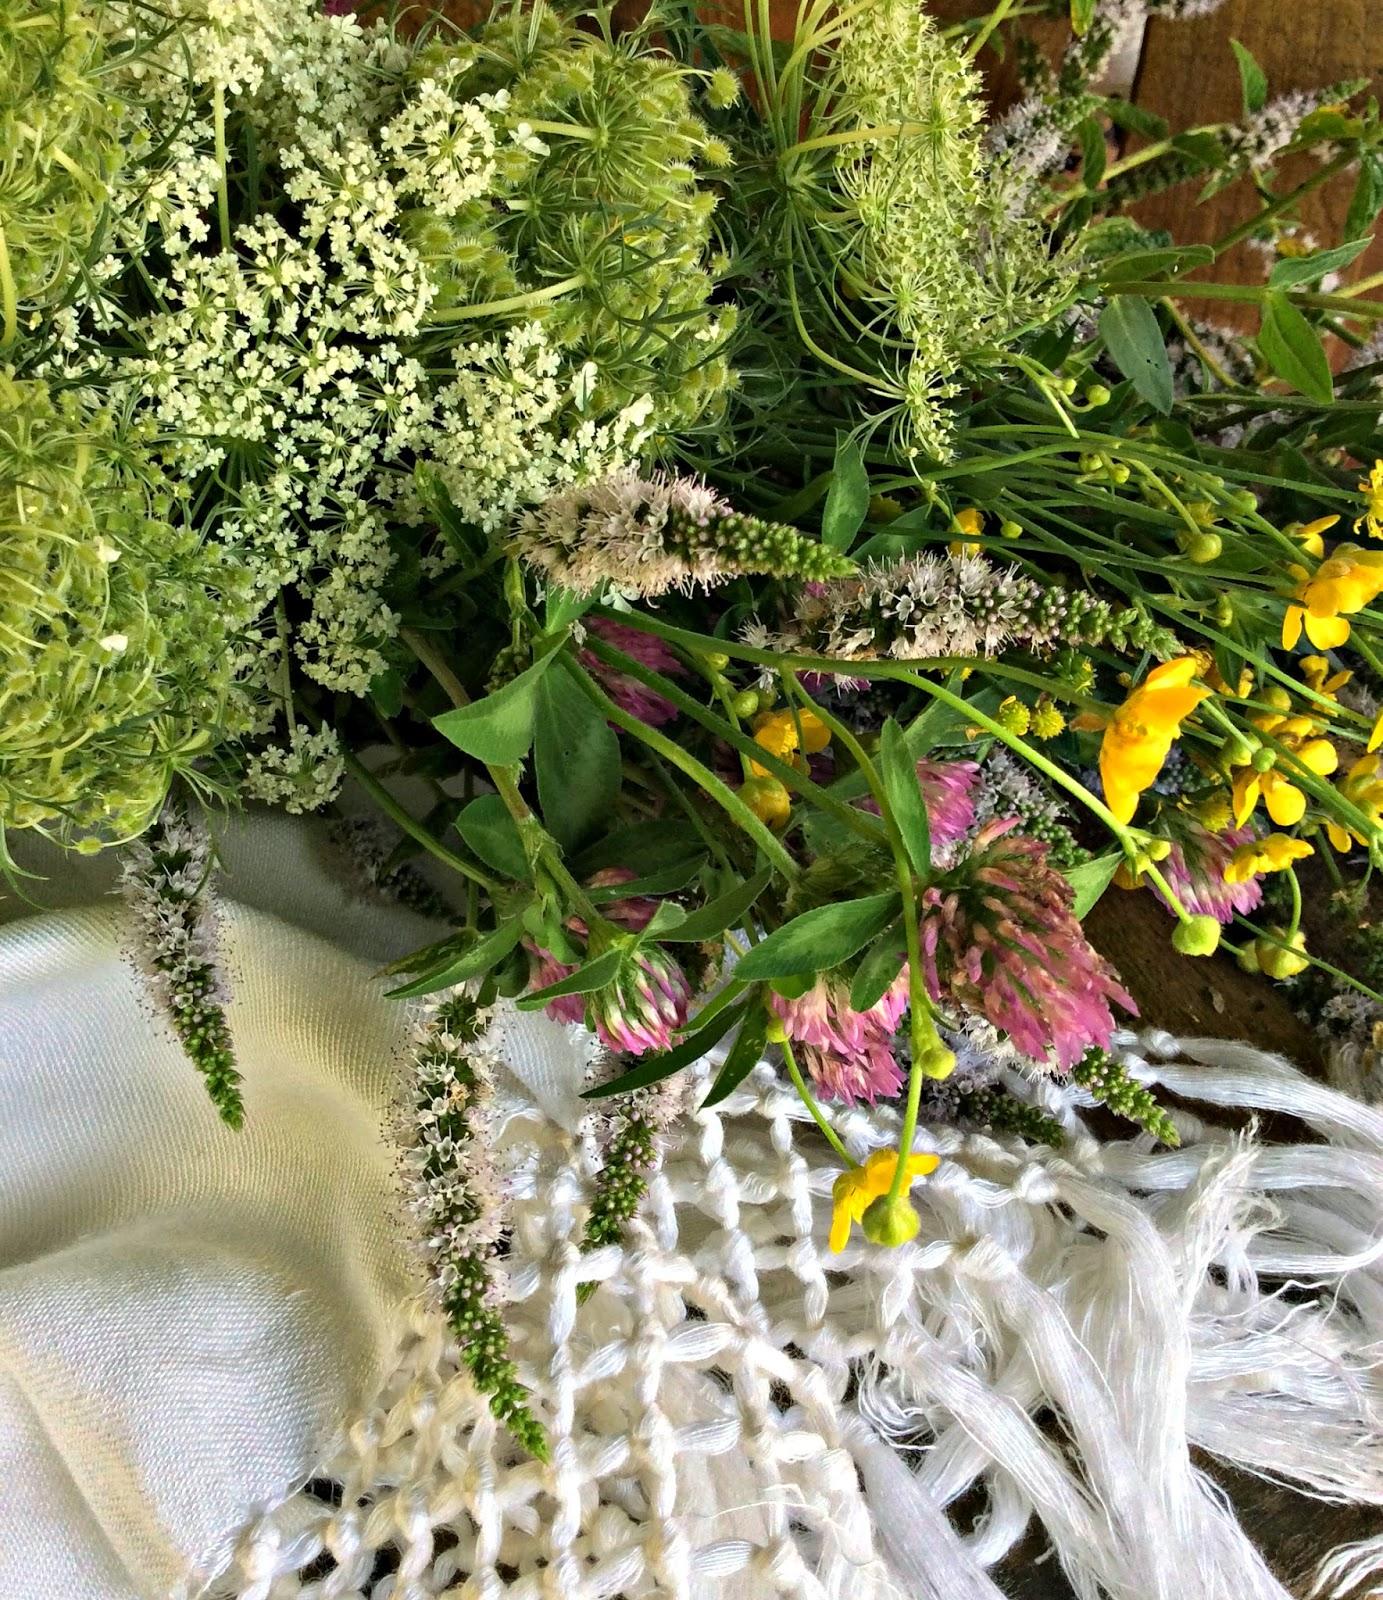 Foto mazzi di fiori di campo - Immagini di fiori tedeschi ...